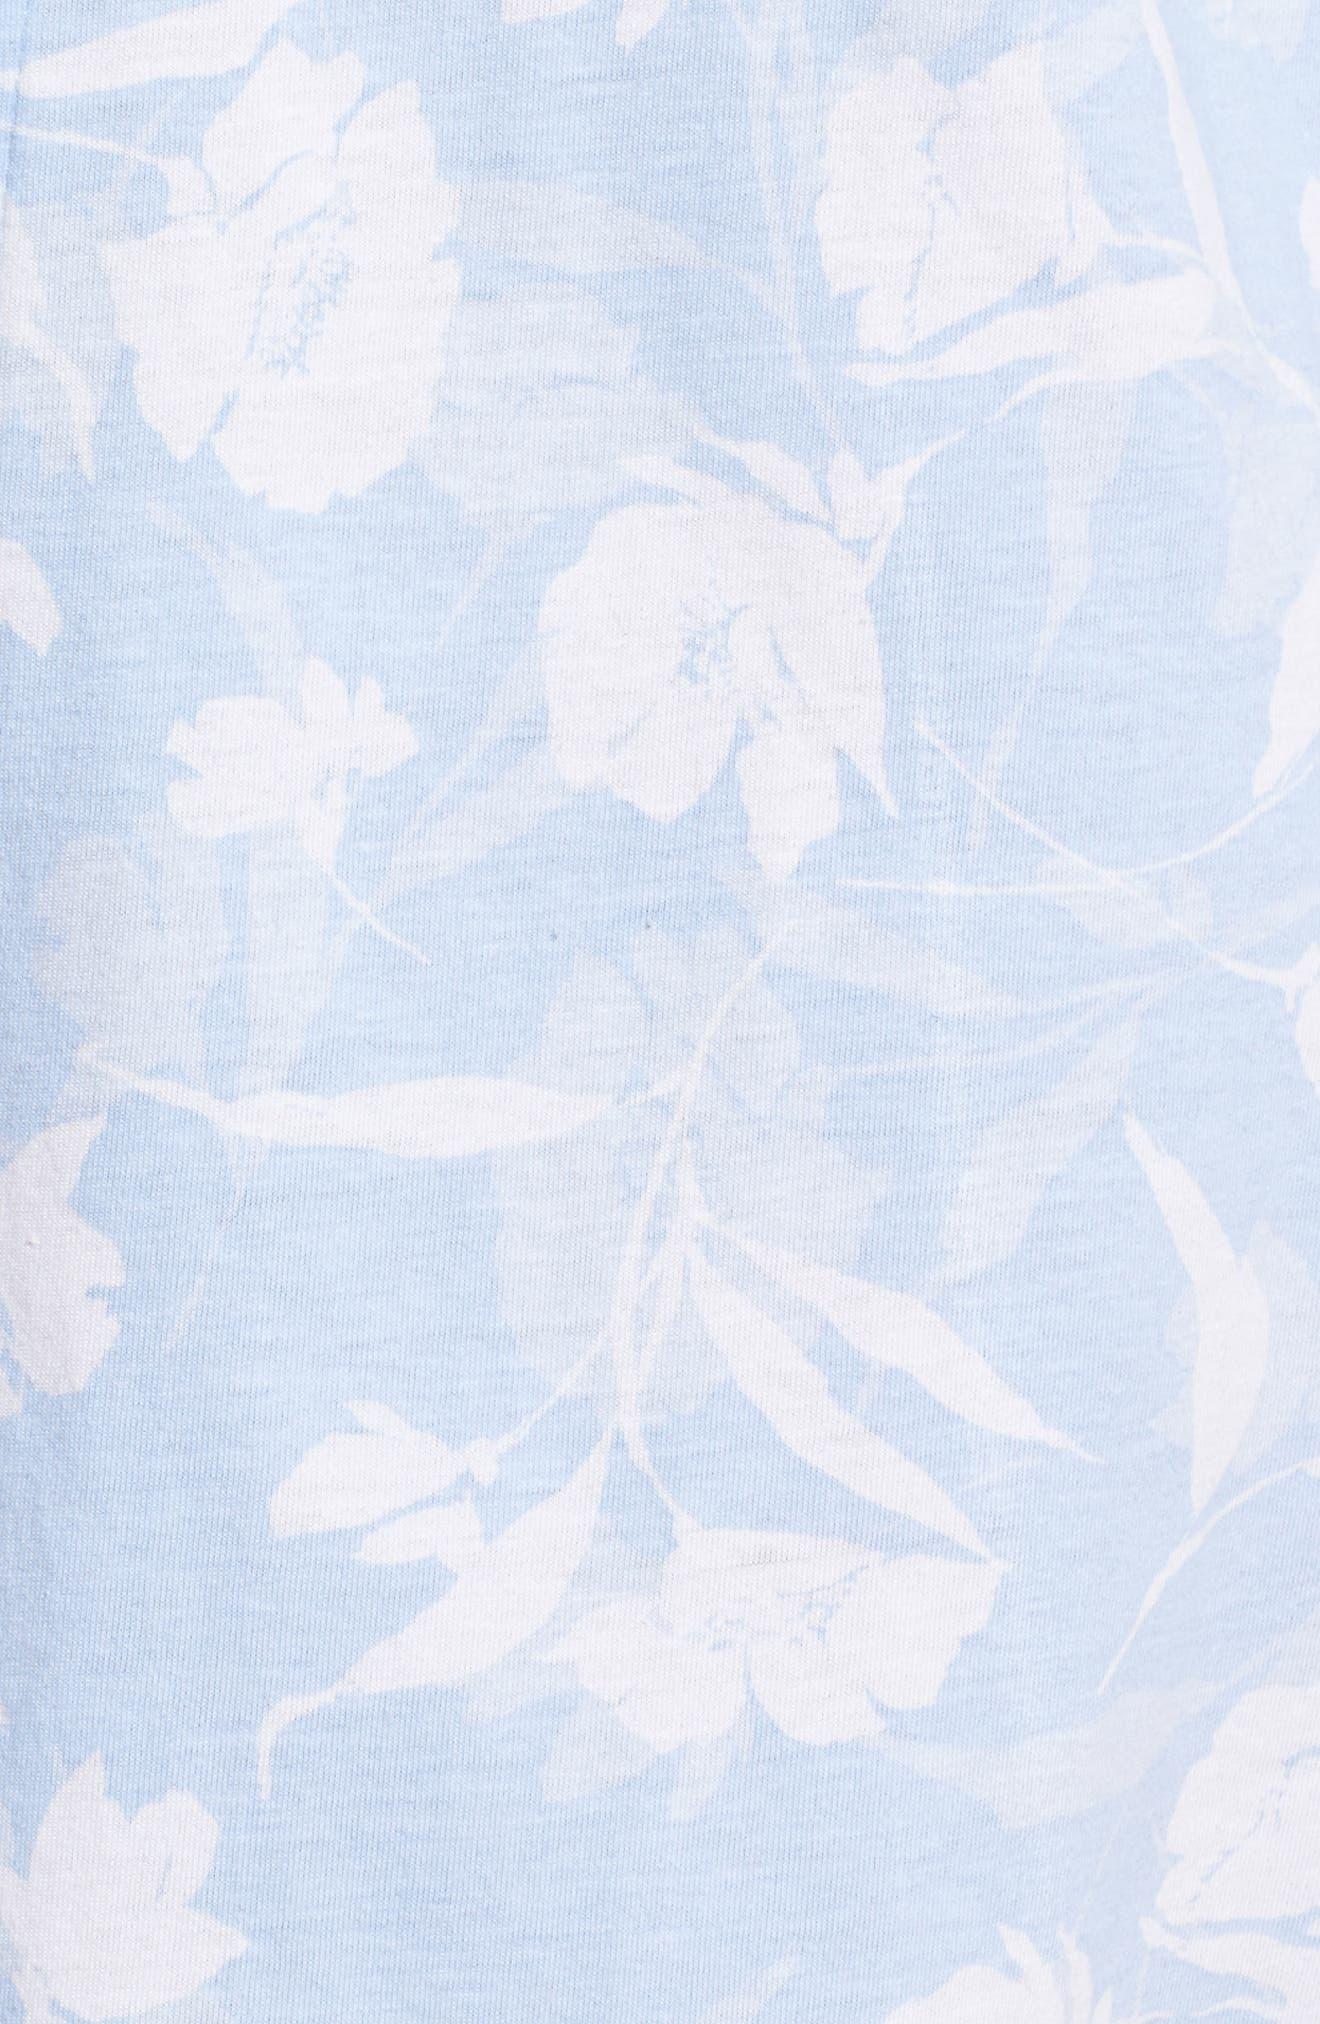 Notch Collar Sleep Shirt,                             Alternate thumbnail 5, color,                             Pale Blue Monotone Floral